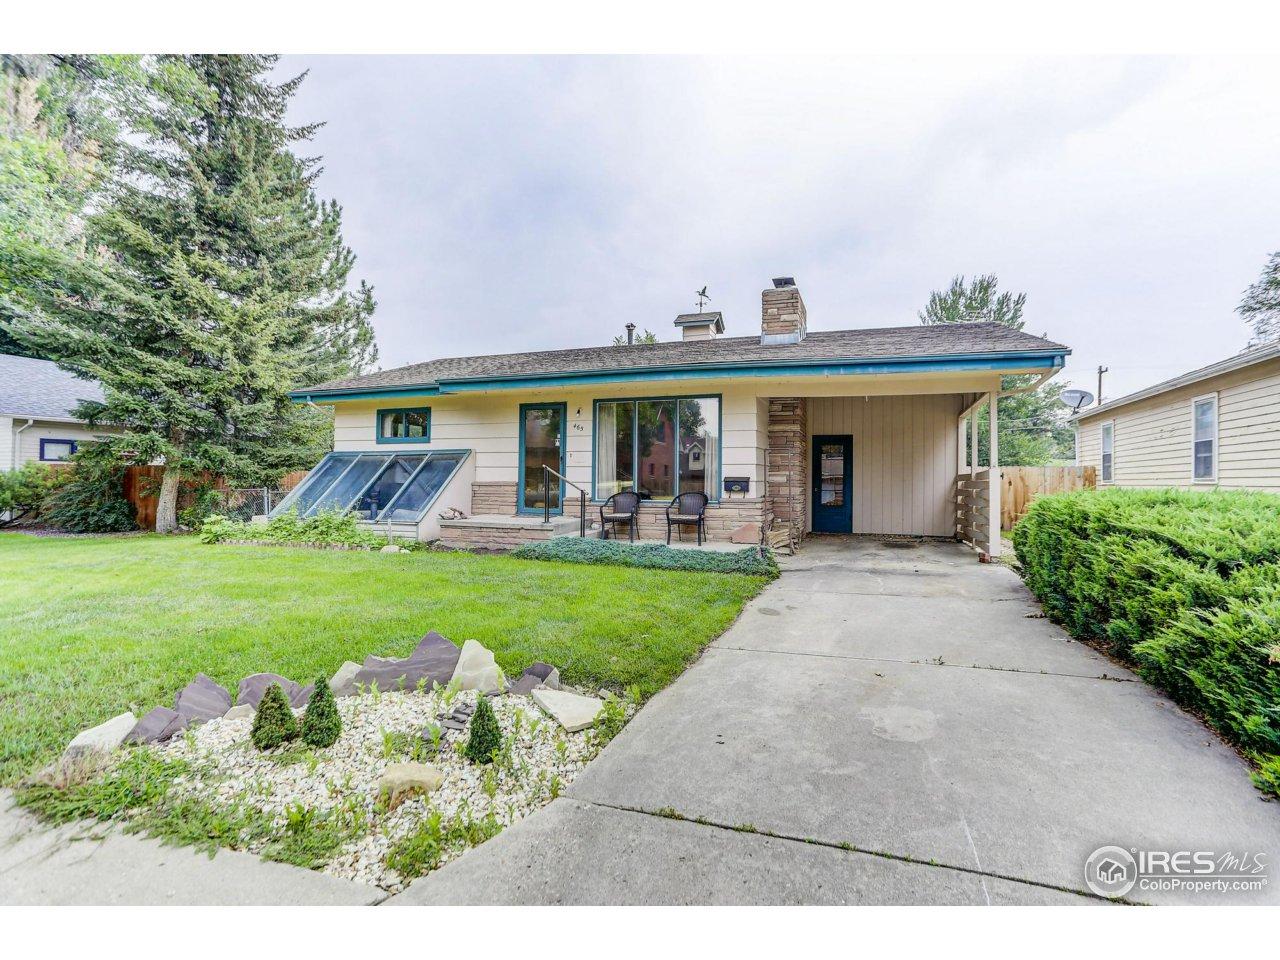 465 W 9th St, Loveland, CO 80537